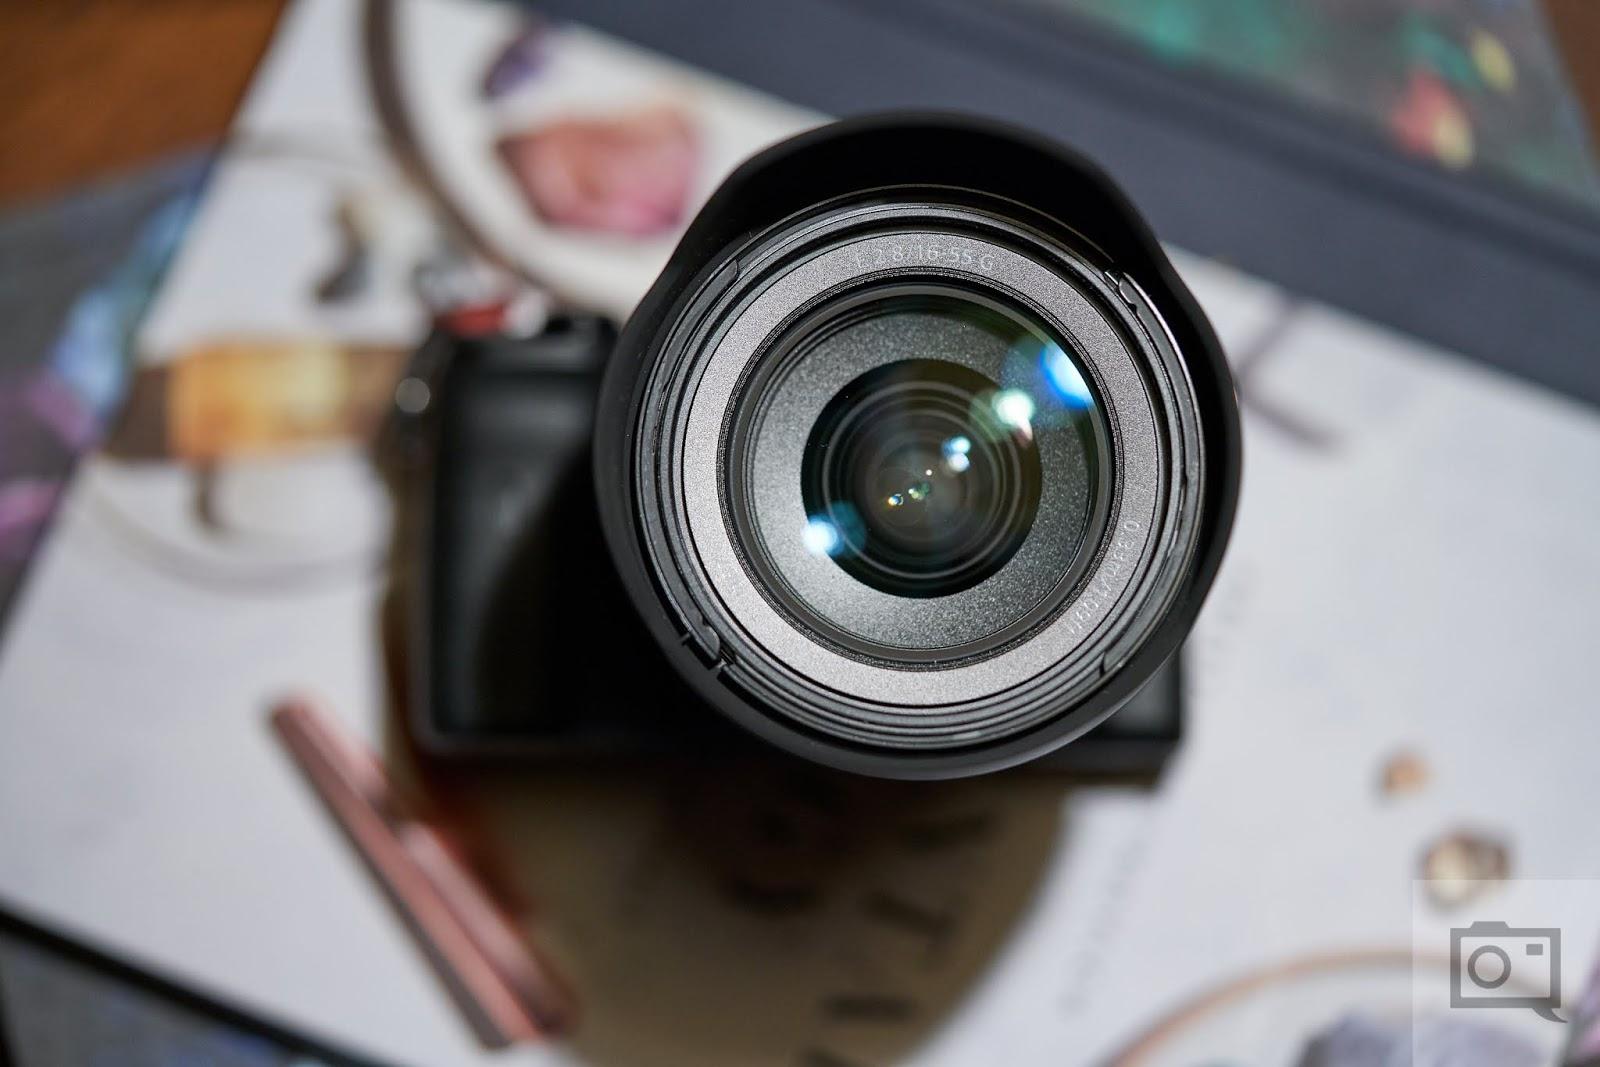 Объектив Sony E 16-55mm f/2.8 G с камерой Sony A6600, вид спереди